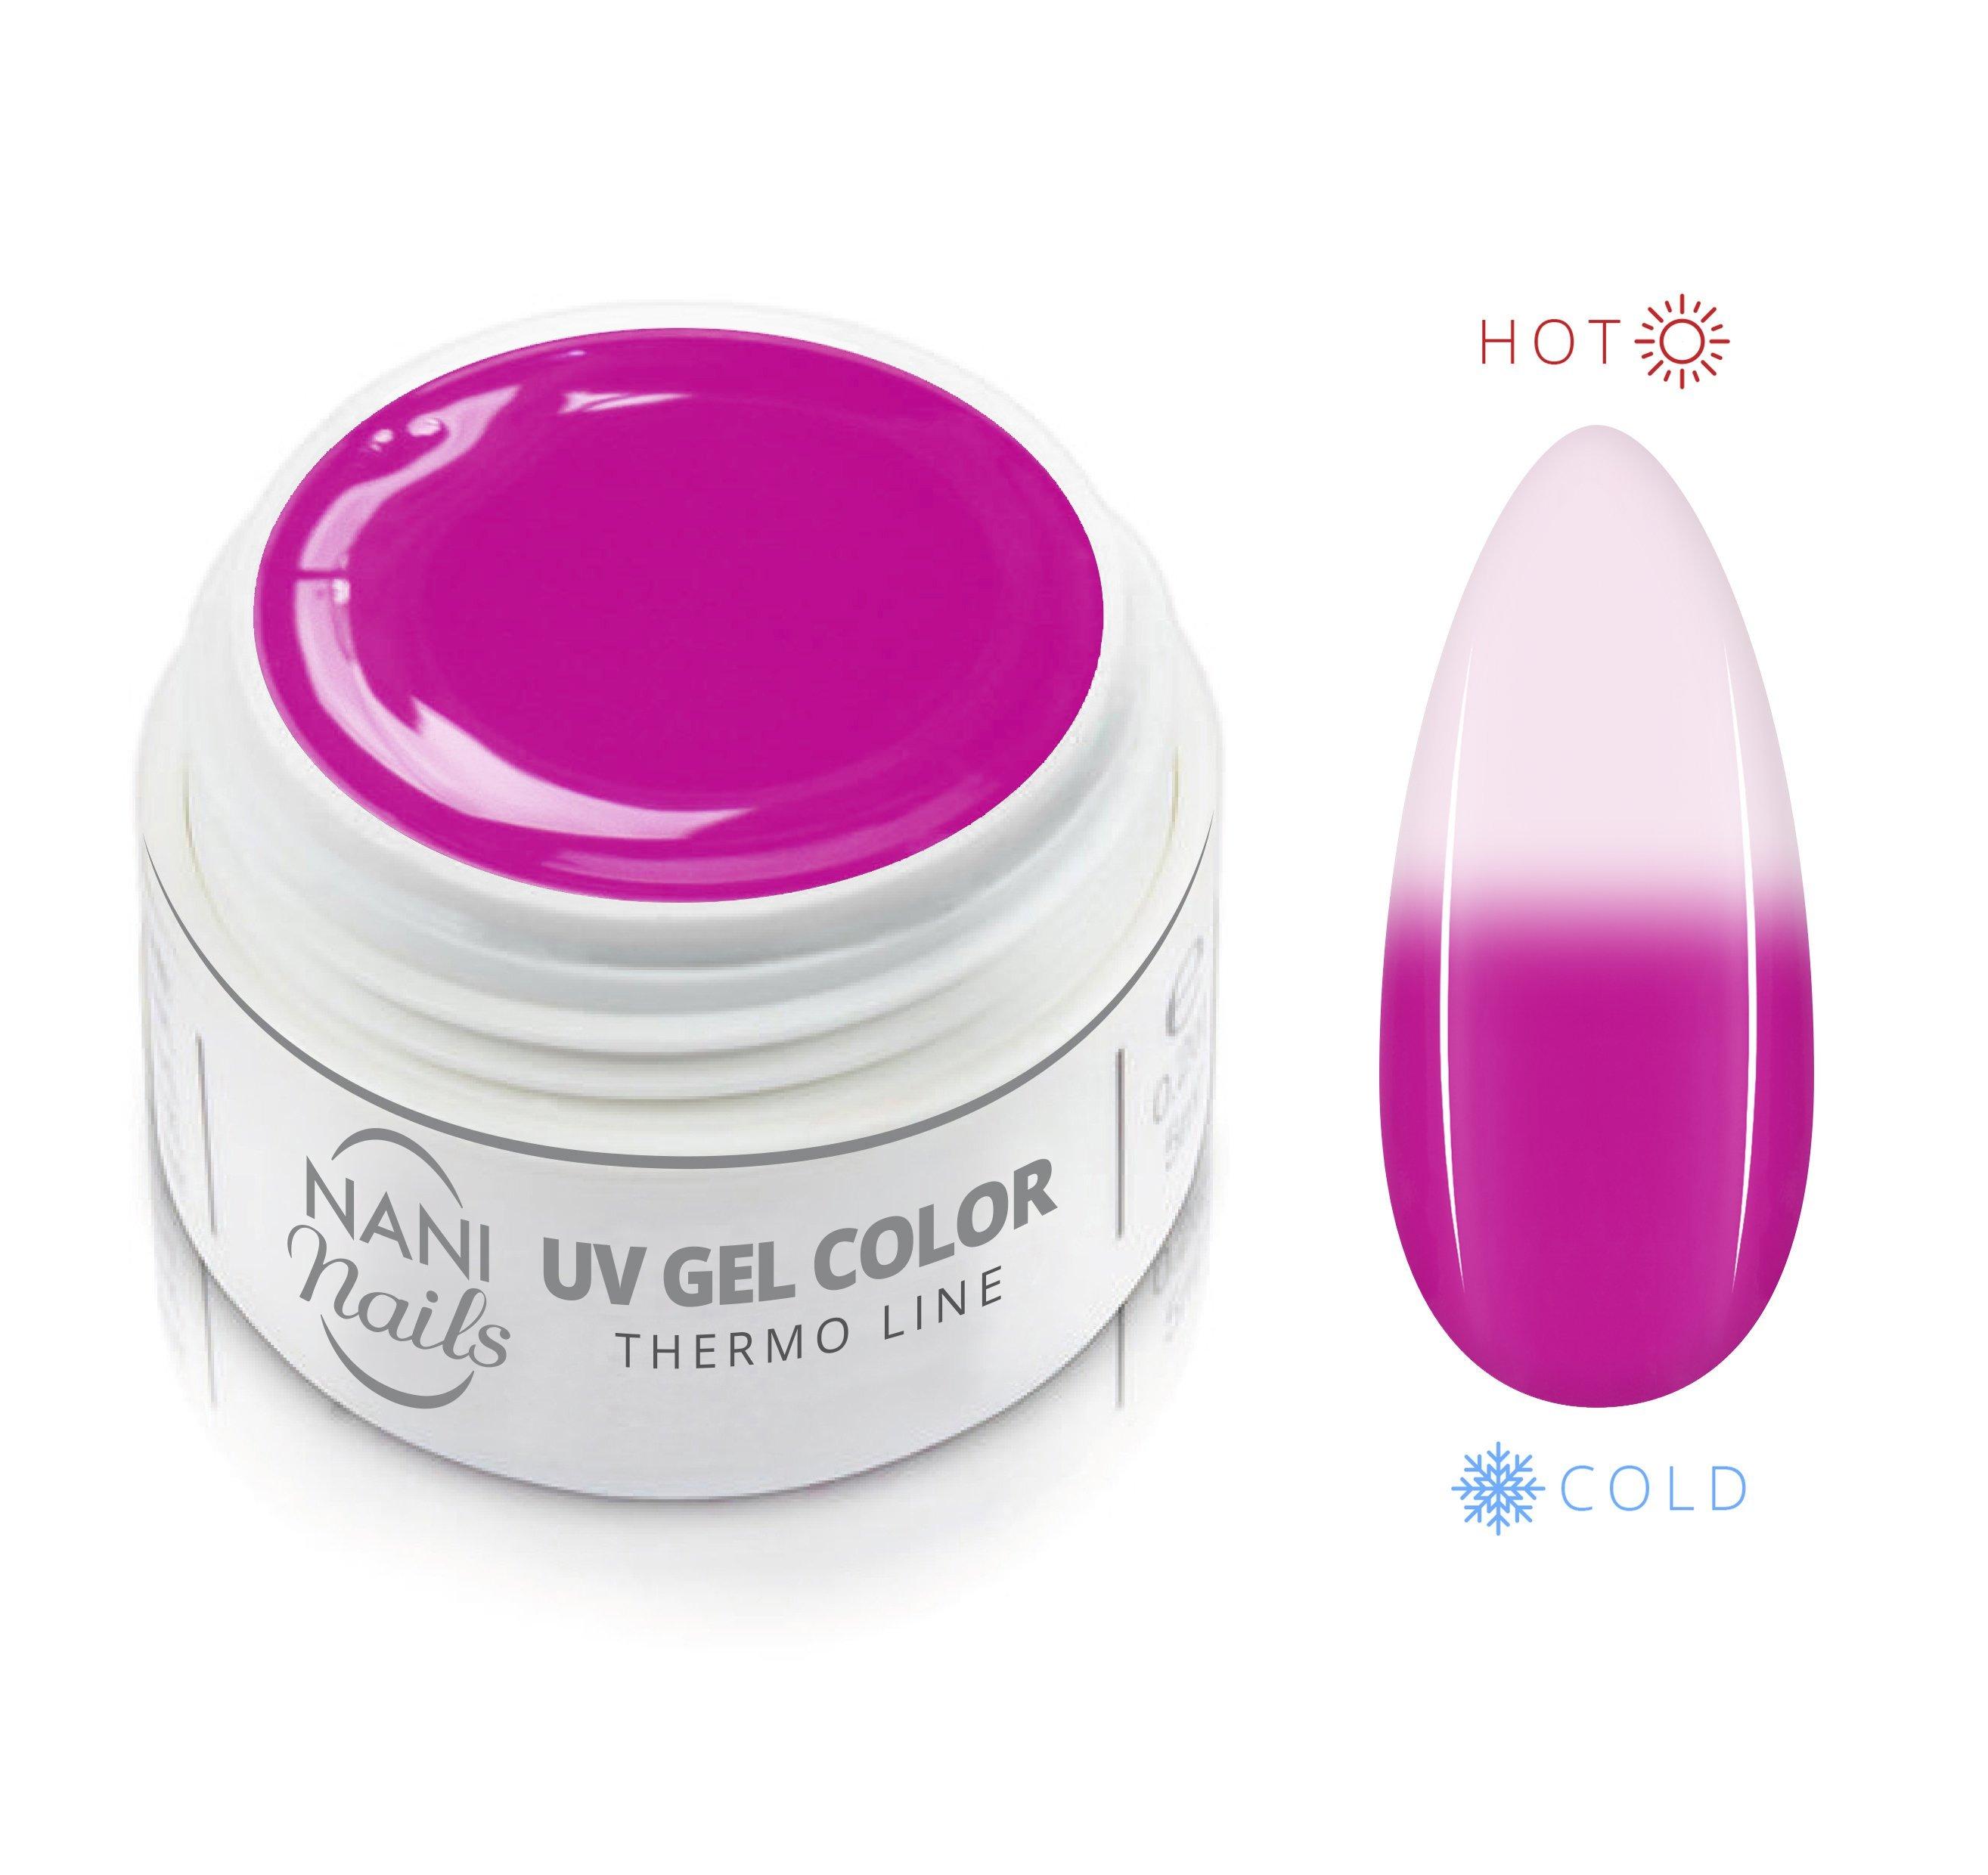 Gel UV Termic NANI 5 ml - Roz/albă